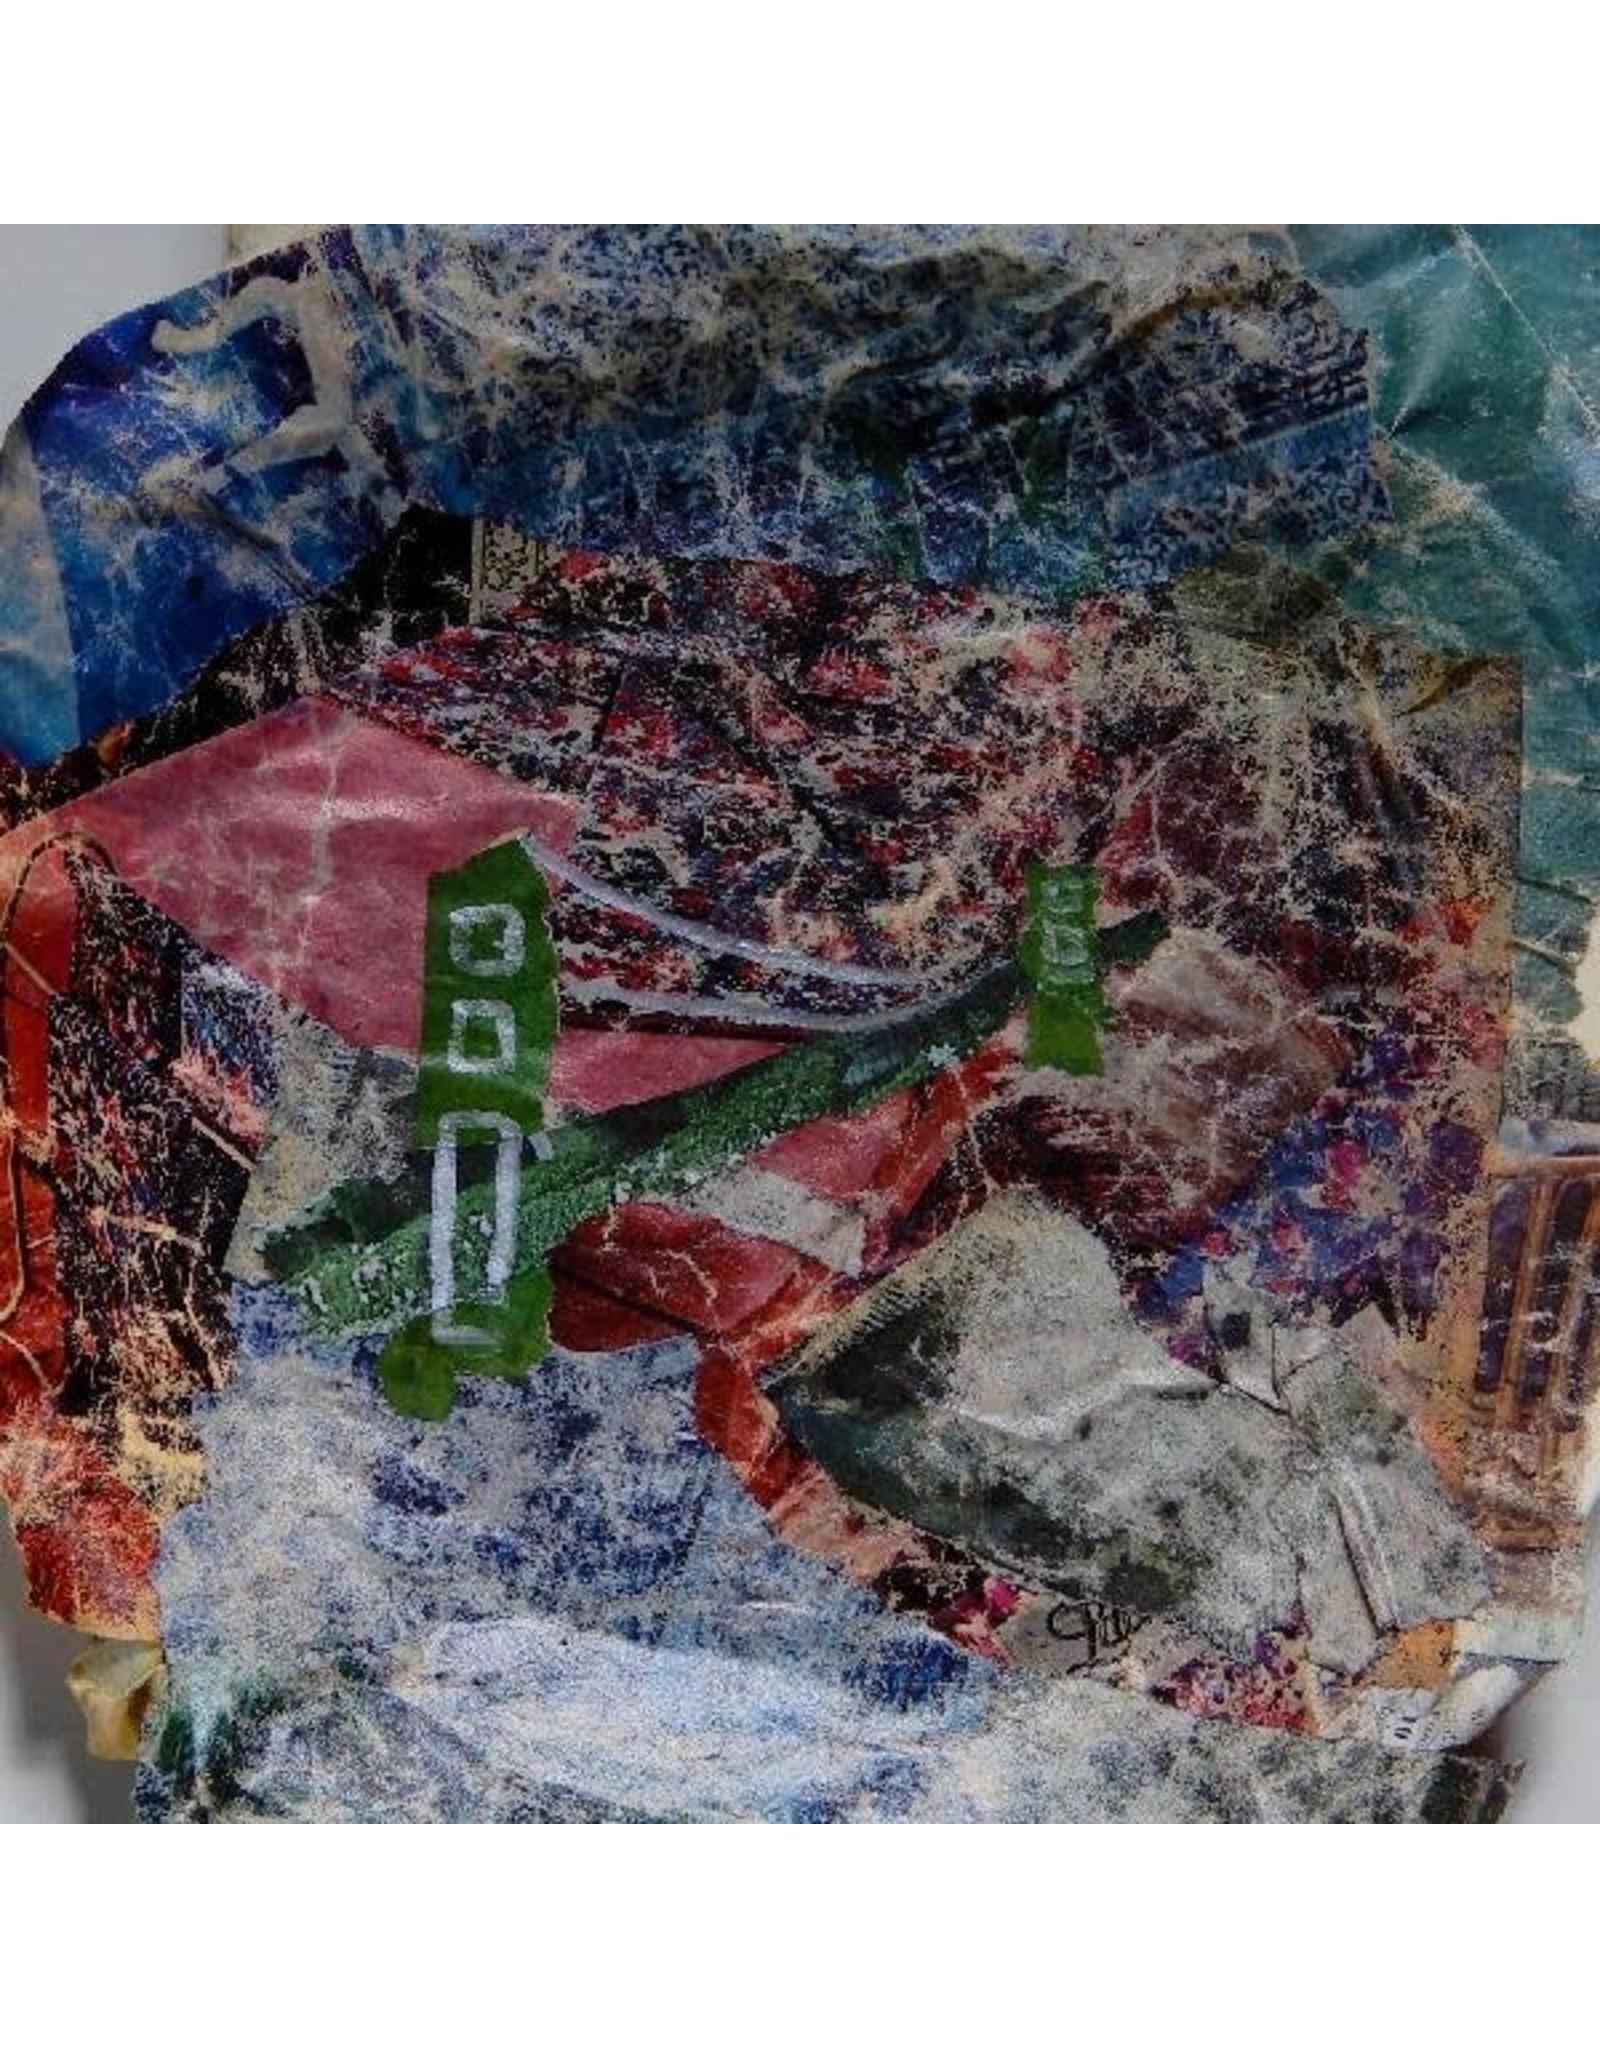 Domino Animal Collective: Bridge to Quiet LP